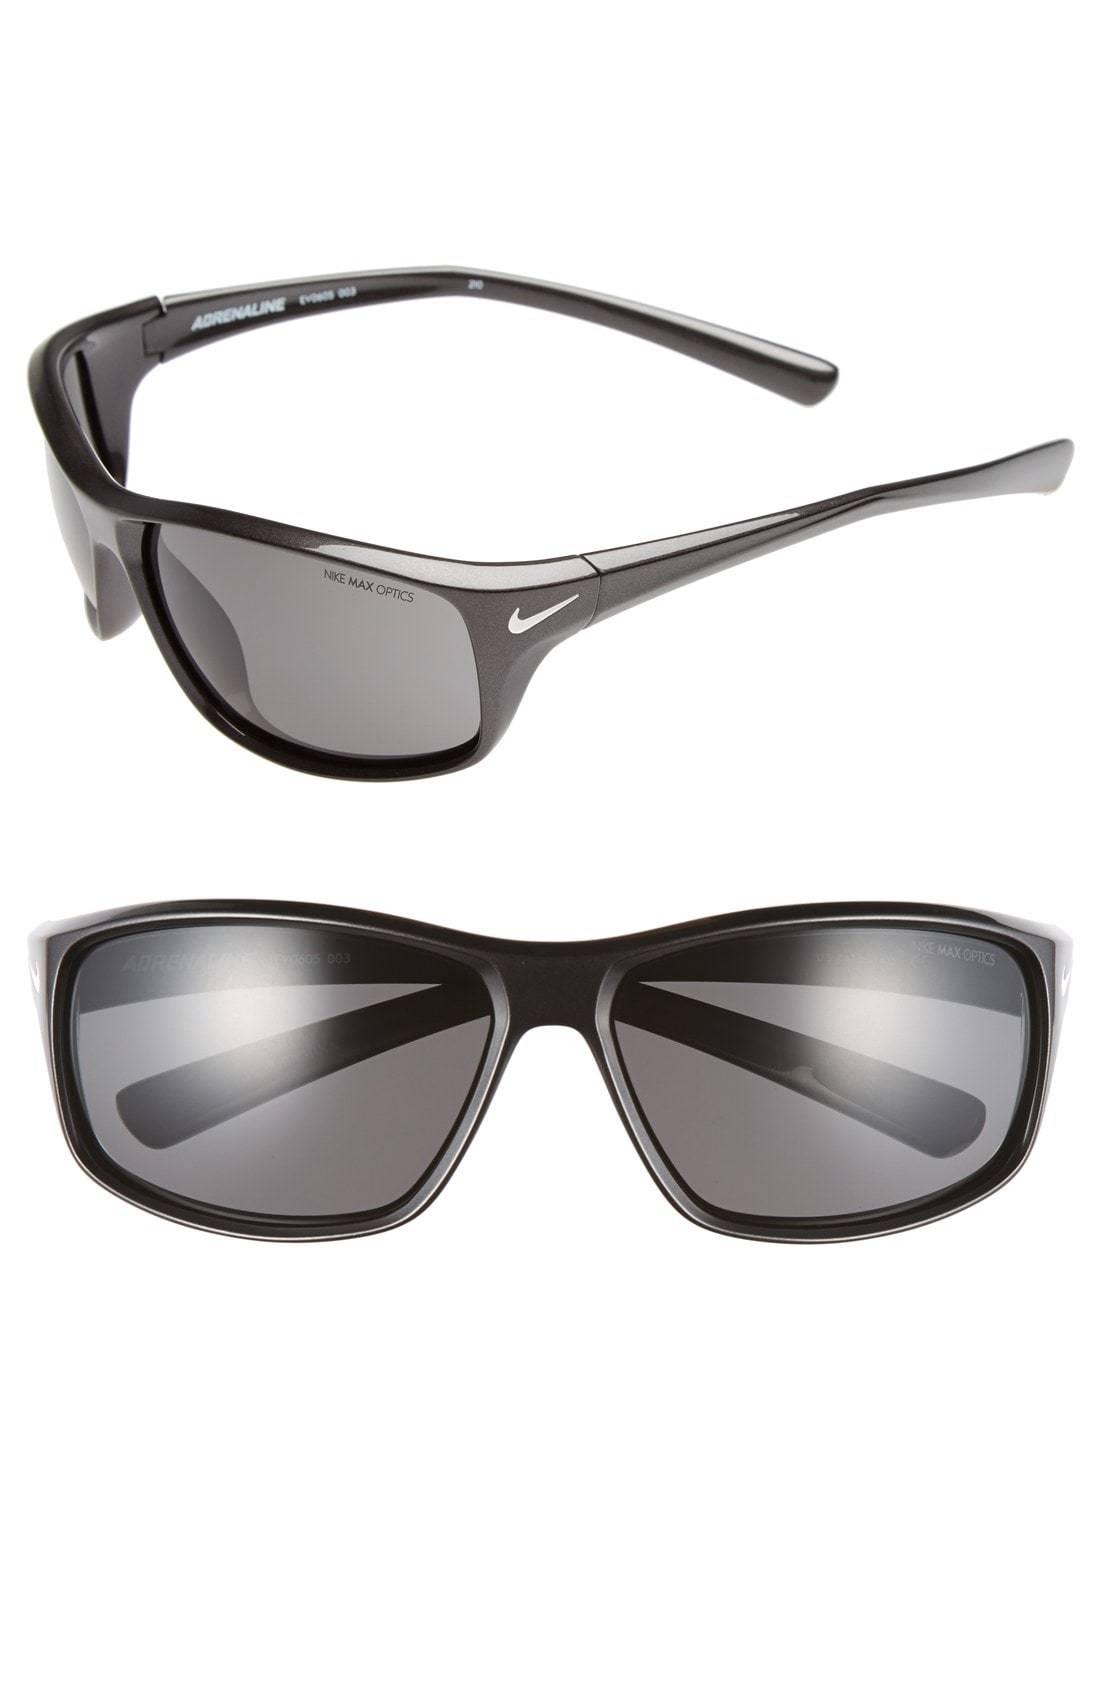 Nike Adrenaline 64mm Sunglasses